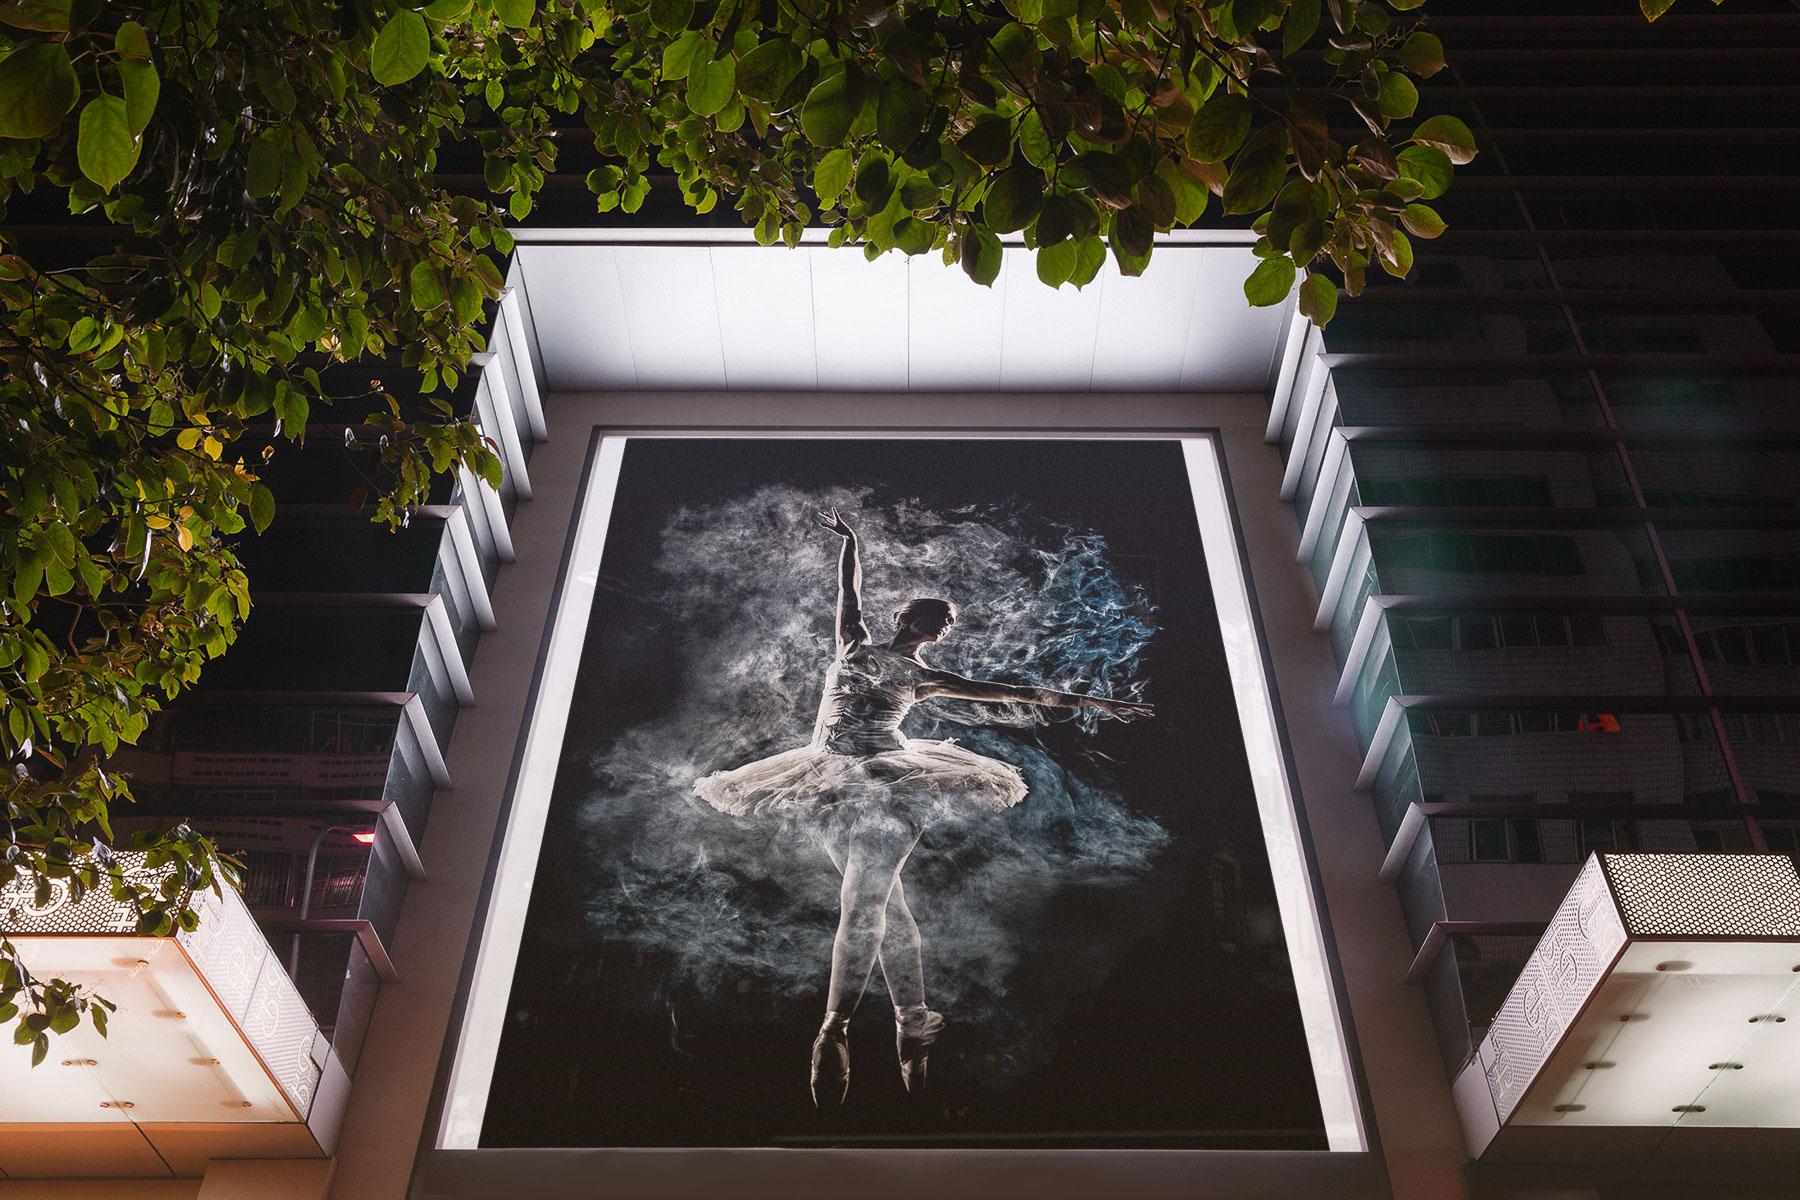 anhede-photo-art-for-hotels-ballerina-building-web